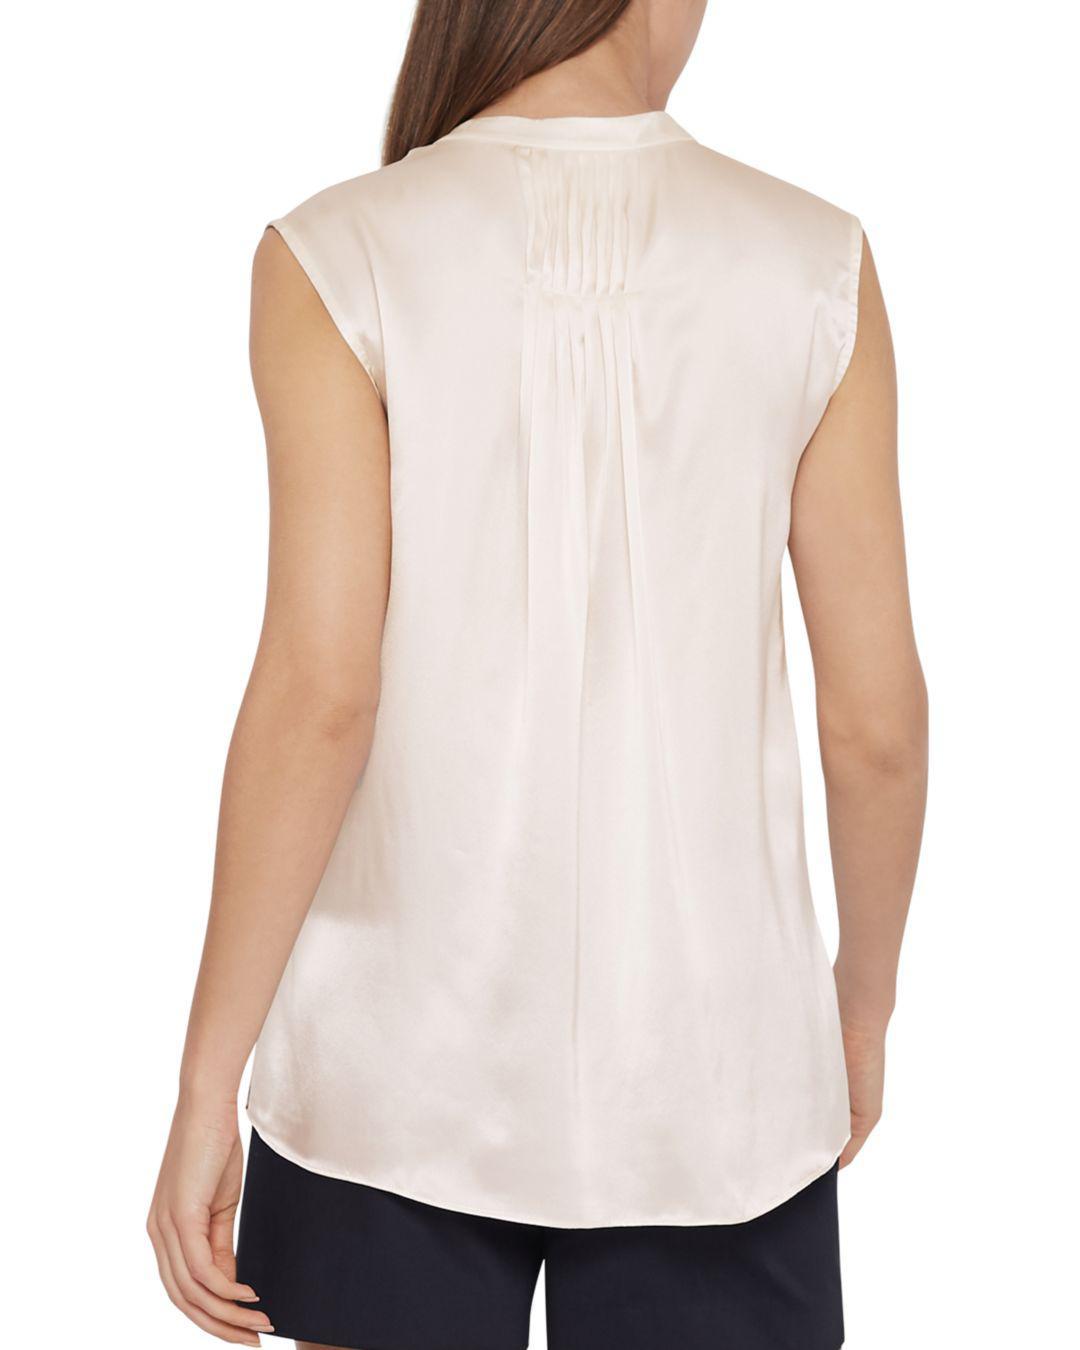 c7052b55c5d625 Reiss Lila Silk Top in White - Lyst